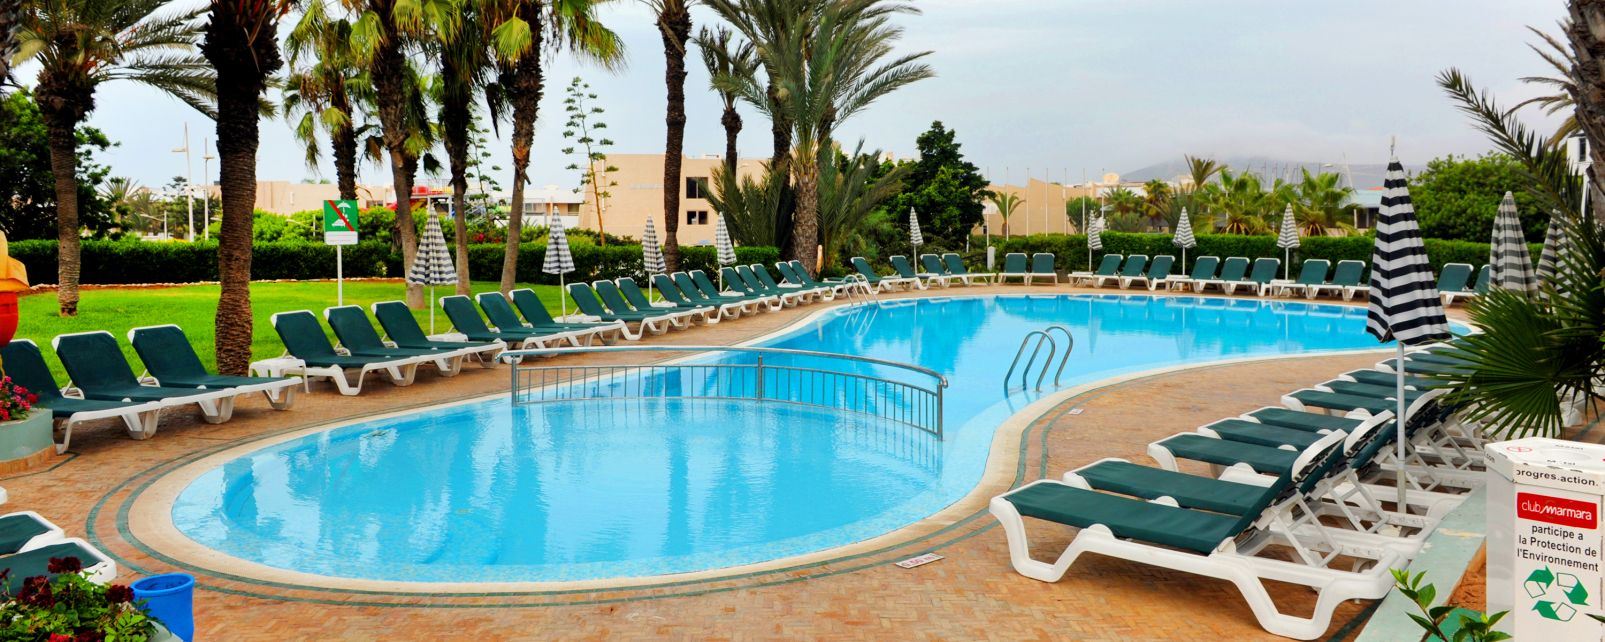 Club Marmara Les Jardins d'Agadir